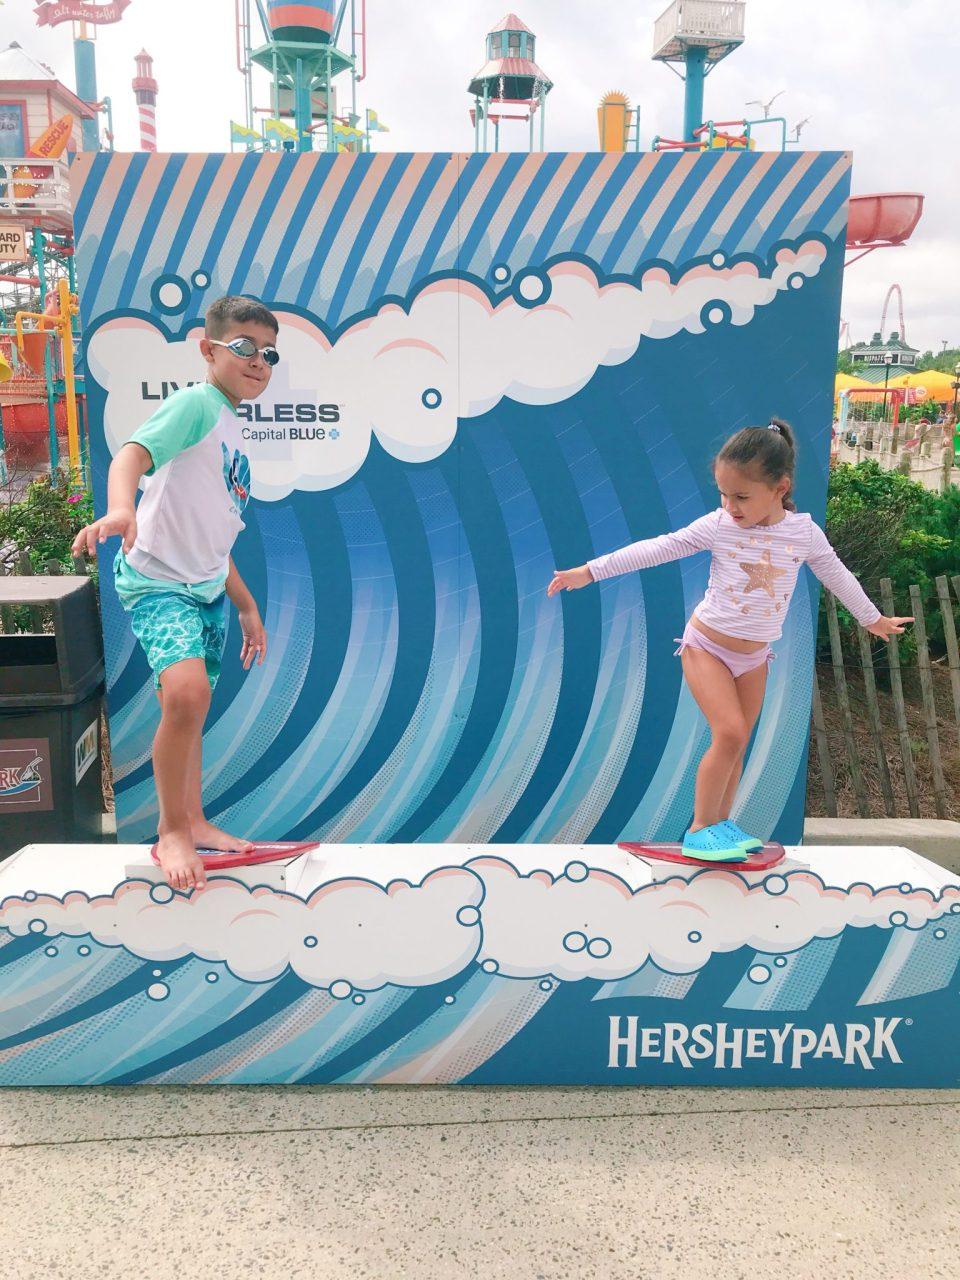 Boardwalk at Hershey Park